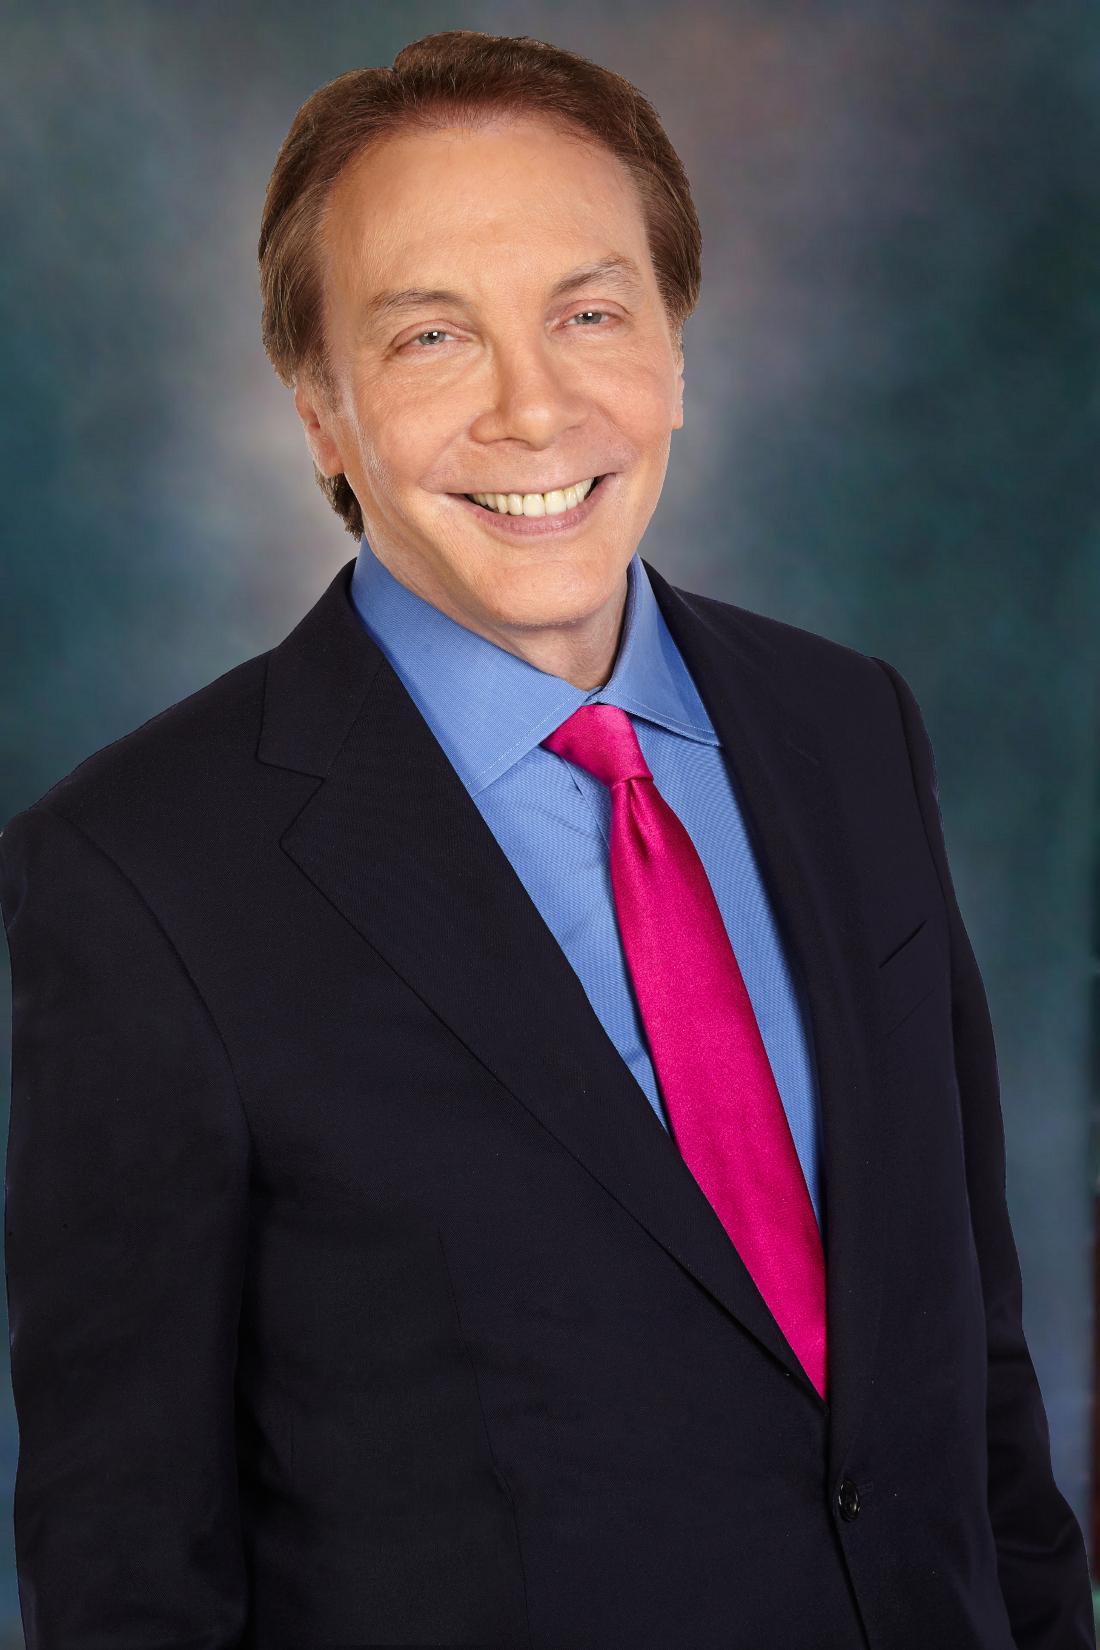 Alan Colmes - Wikipedia